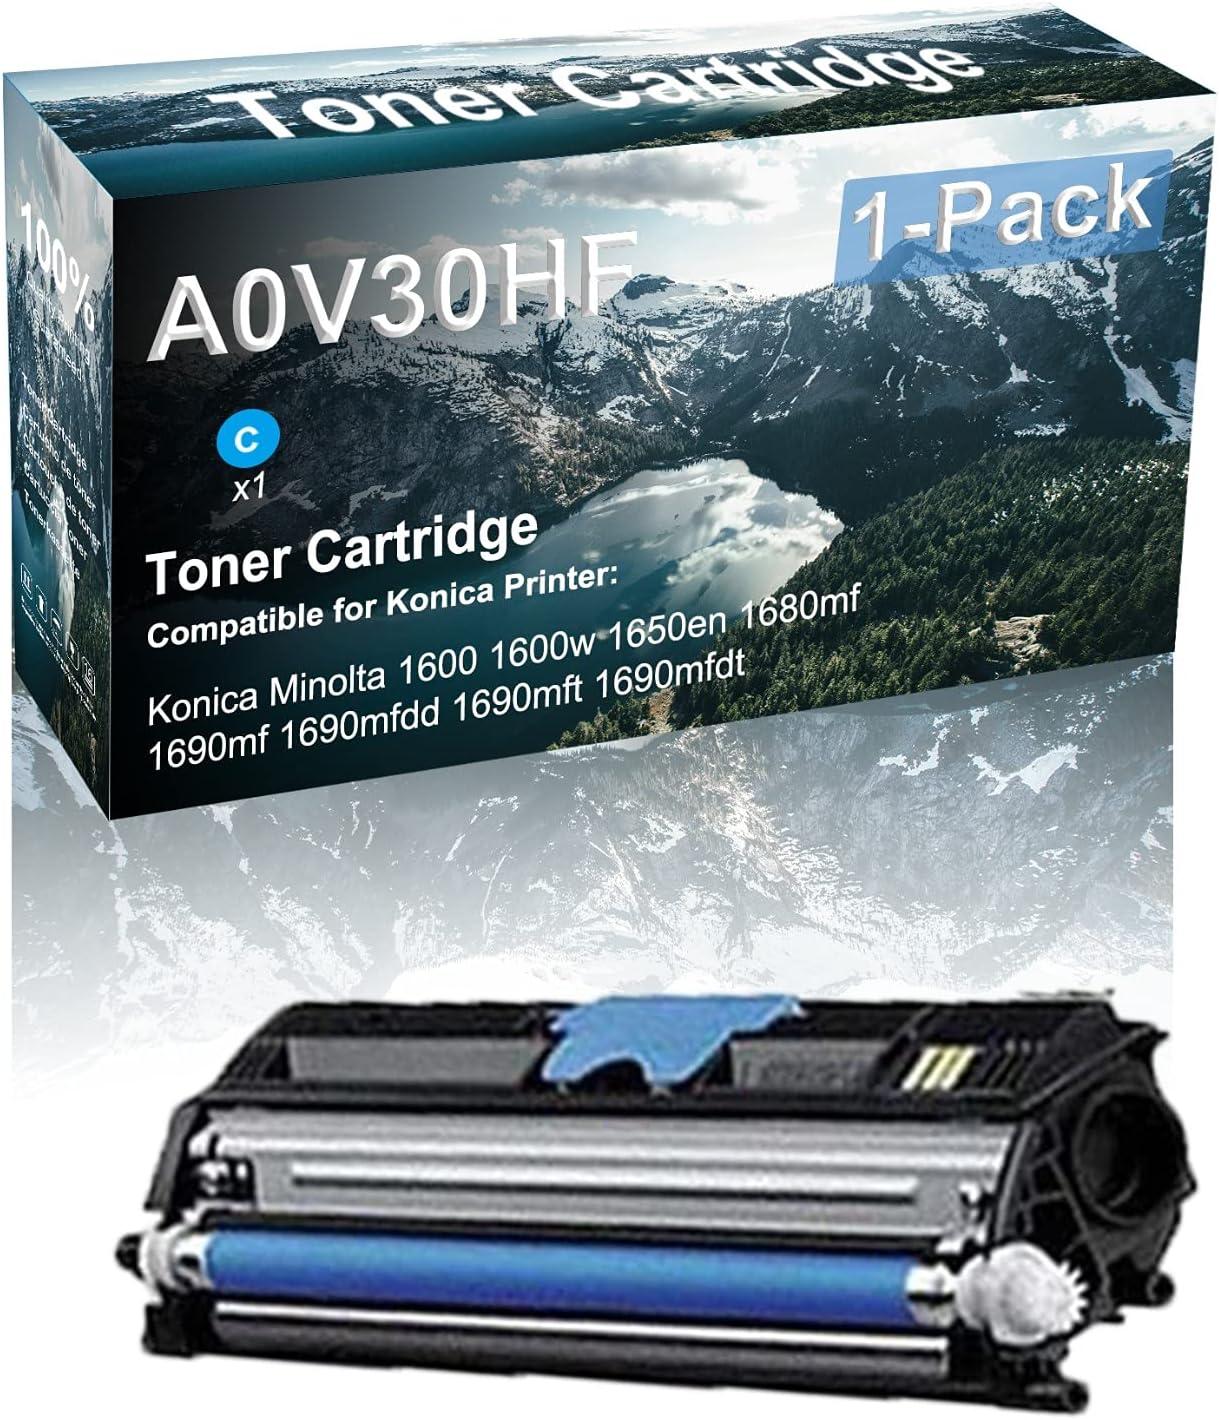 1 Pack (Cyan) Compatible Toner Cartridge Replacement for Konica A0V30HF Printer Toner use for Konica Minolta 690mf 1690mfdd 1690mft 1690mfdt Printer(High Capacity )